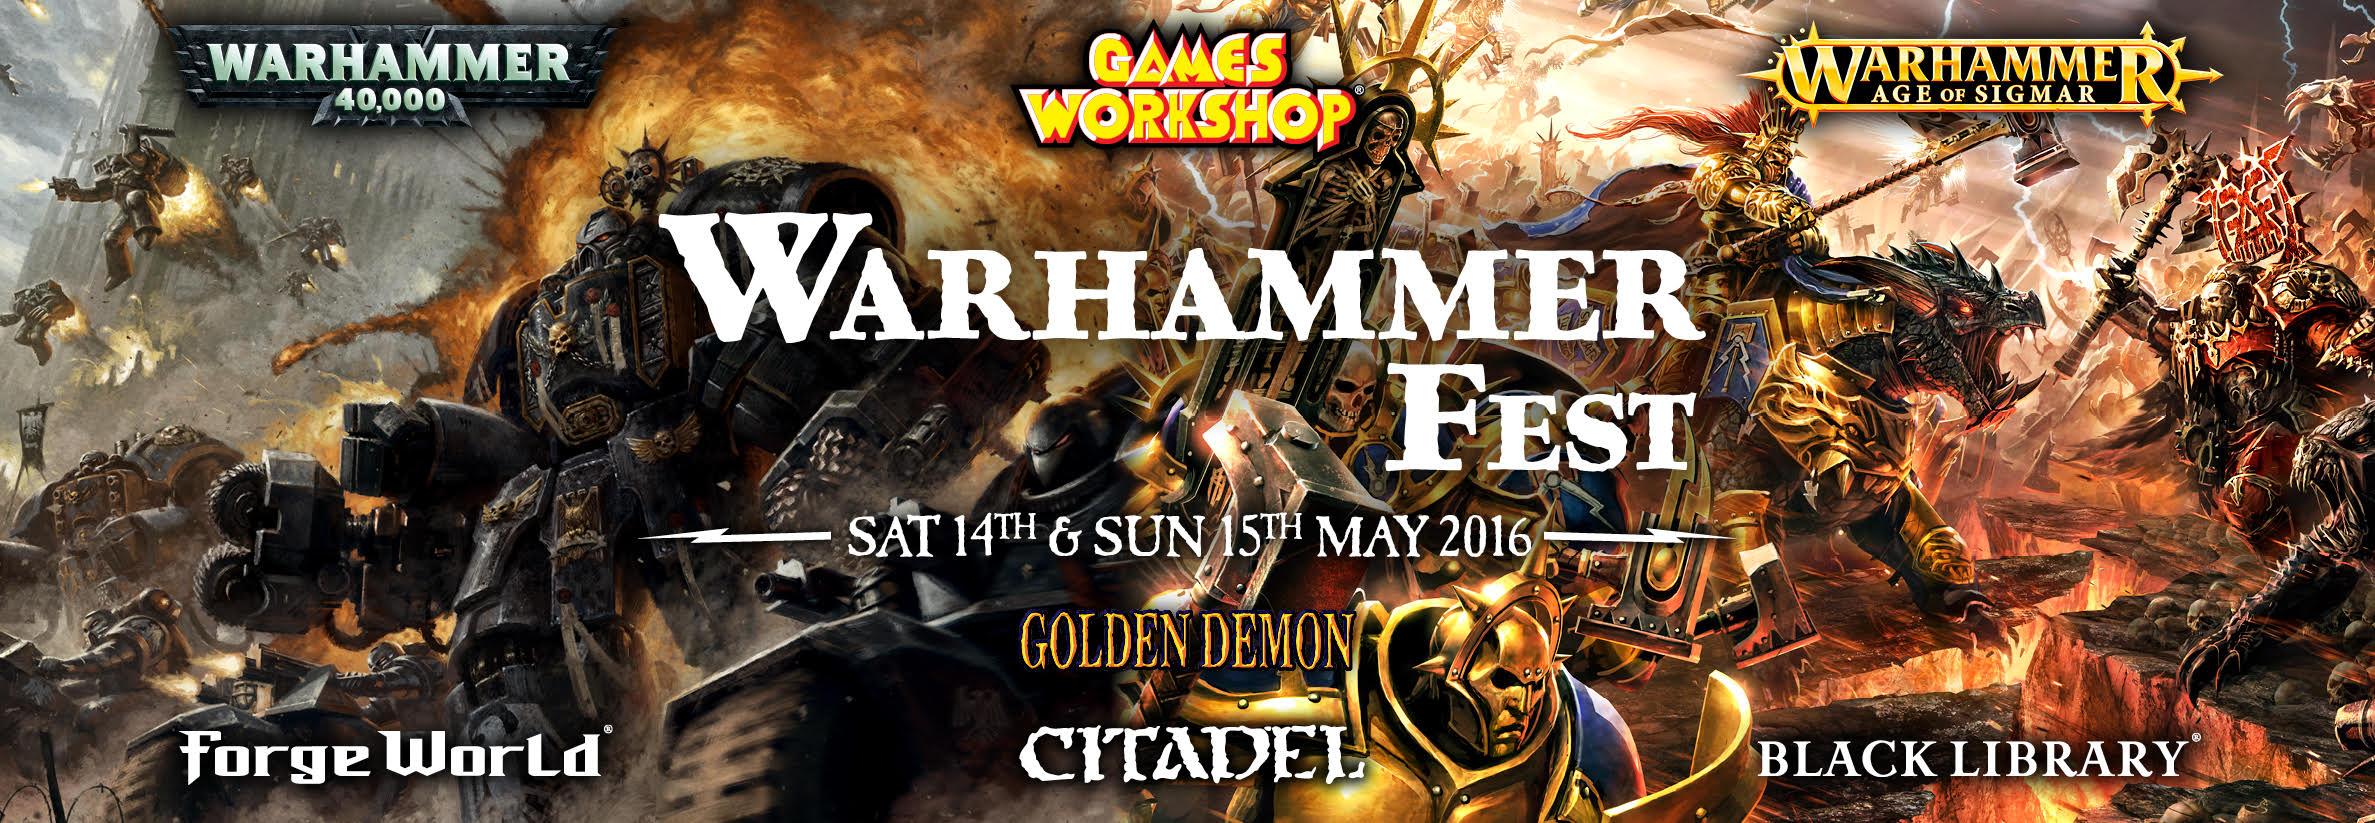 warhammer-fest-2016-sticky